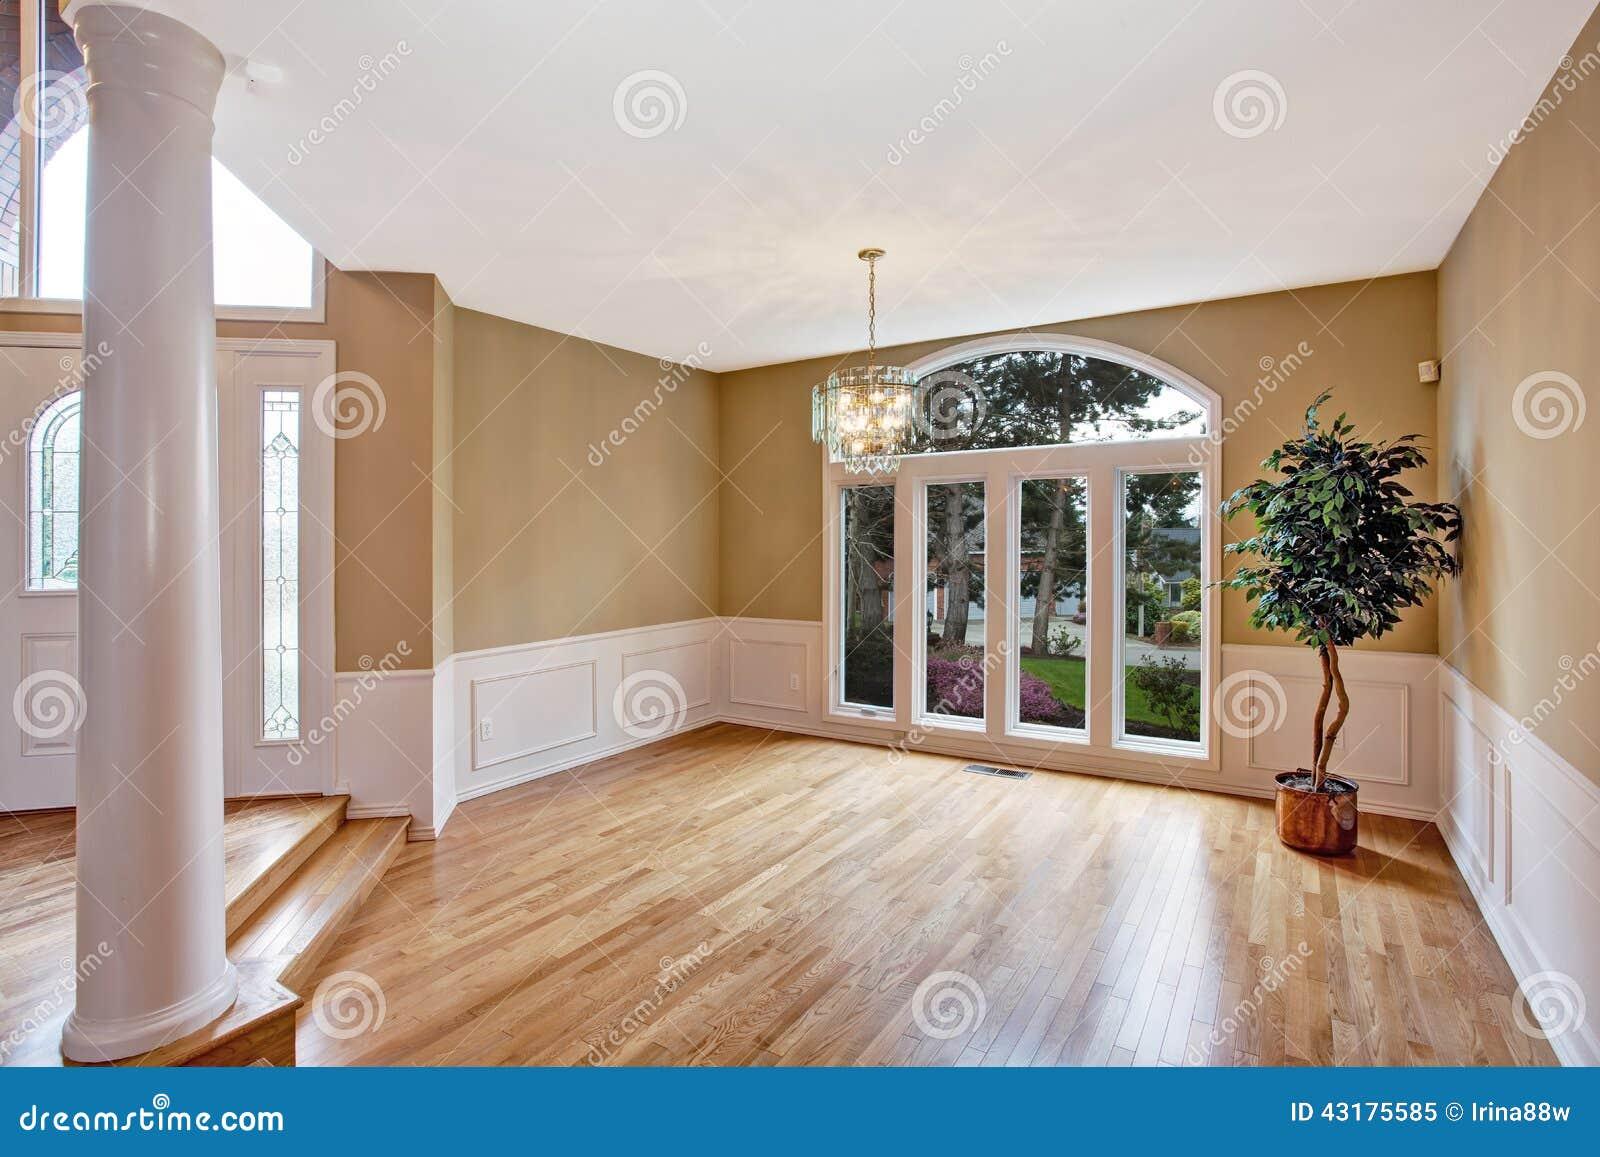 Luxury House Interior Empty Entrance Hallway Stock Image Of Luxury Building 43175585